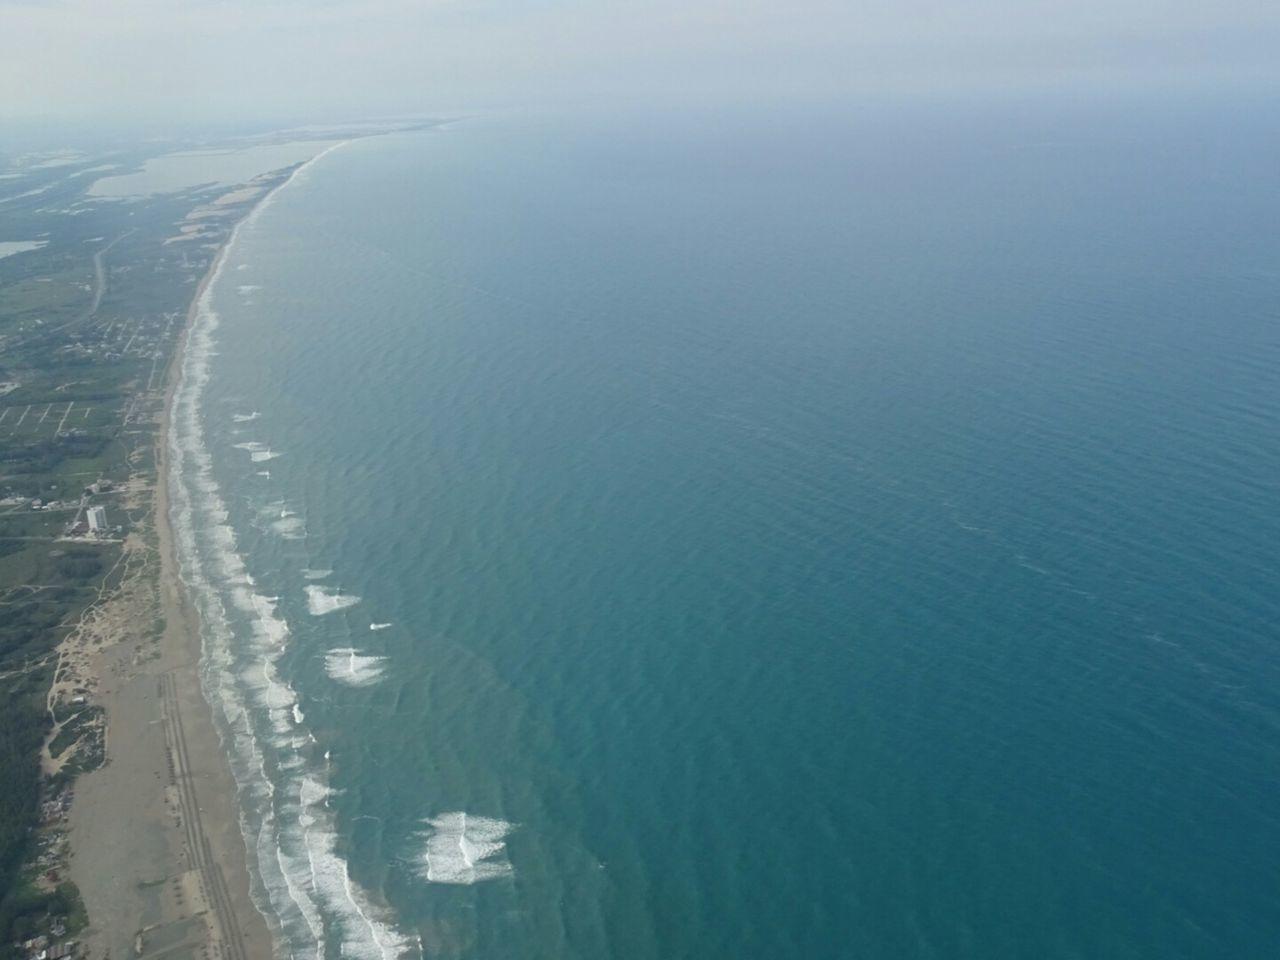 Coastline Calm Waterfront Outdoors Blue Sea And Sky Seascape Tampico